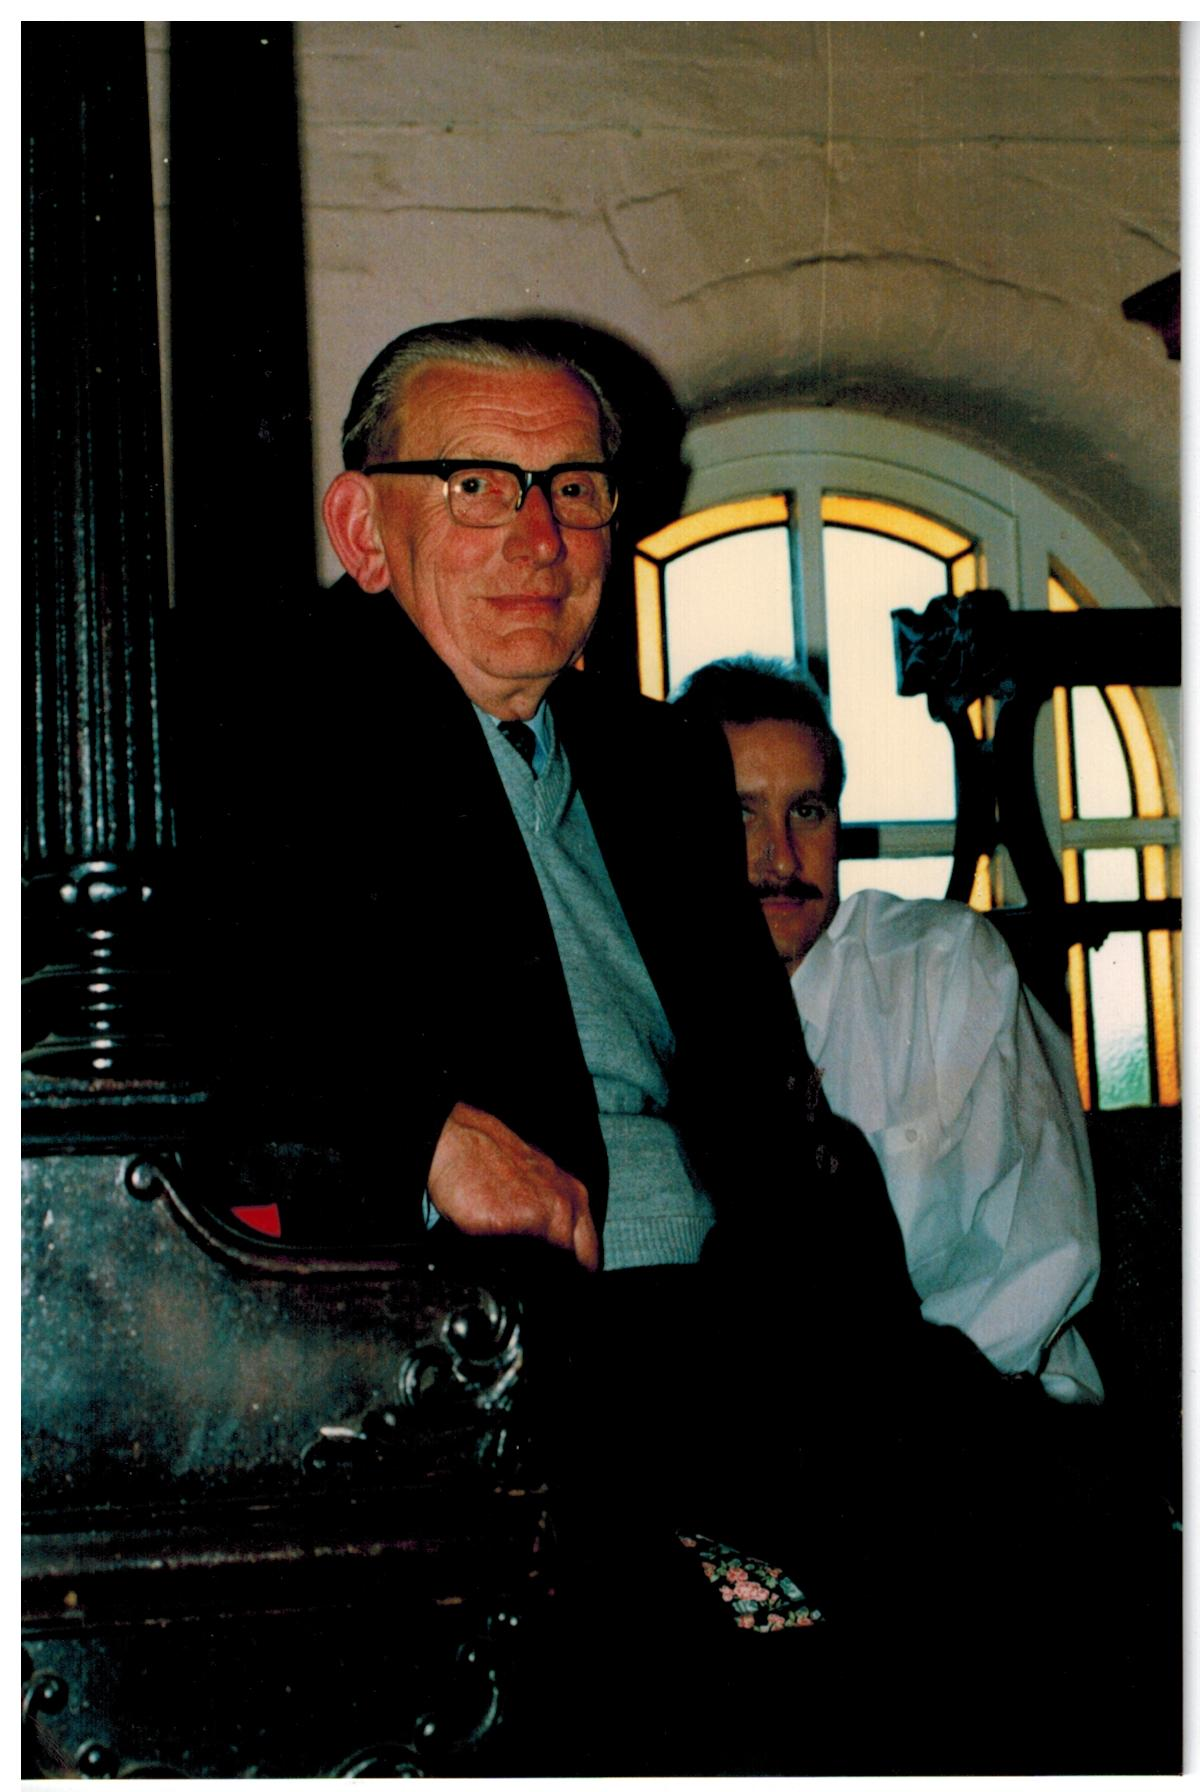 F308_Eddie-Truman[Organist]